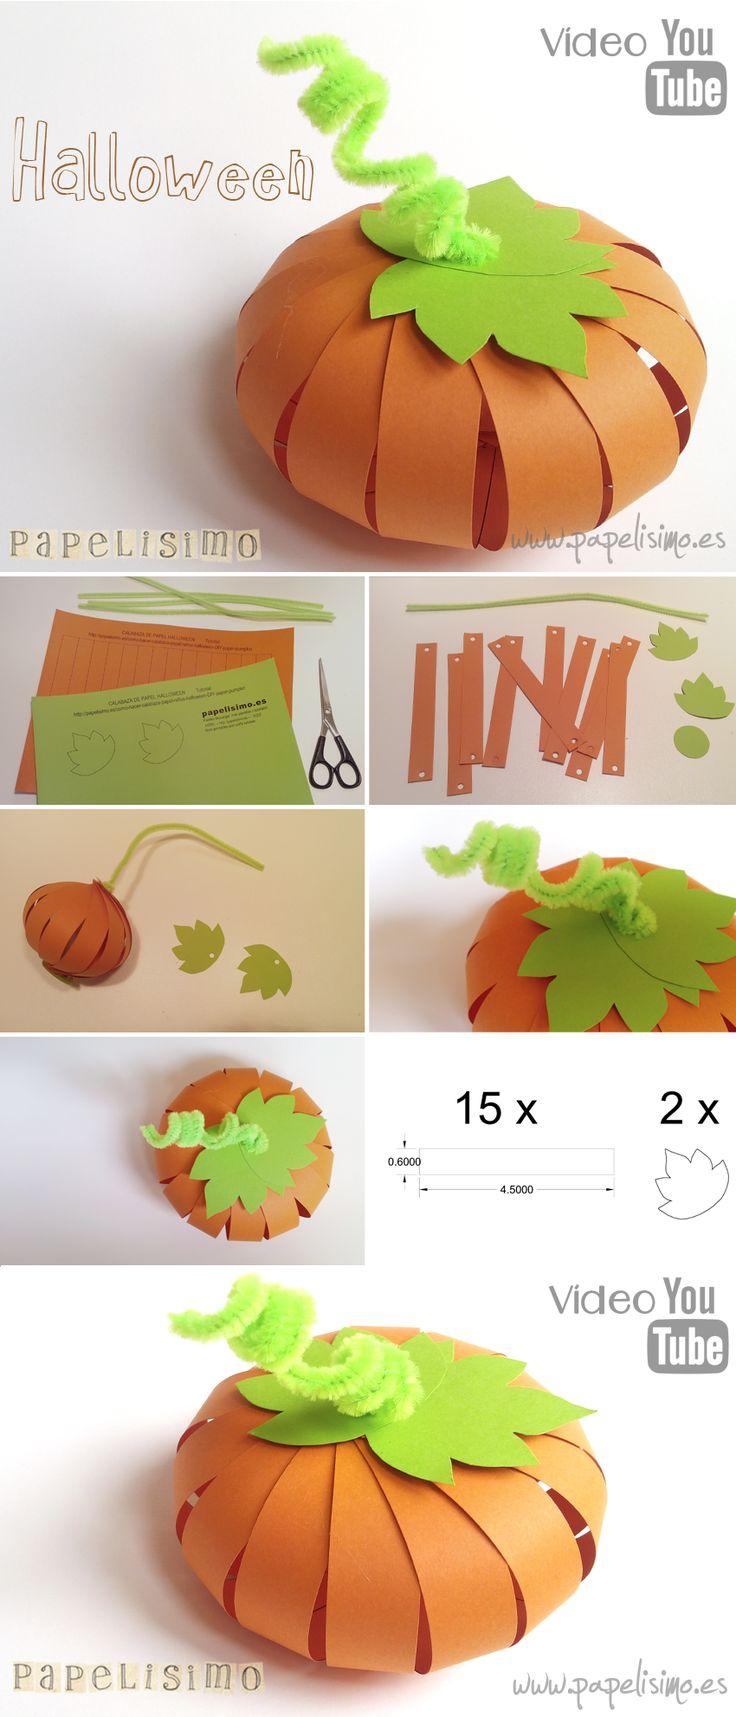 manualidades faciles niños como hacer calabaza de papel halloween DIY paper pumpkin pasos